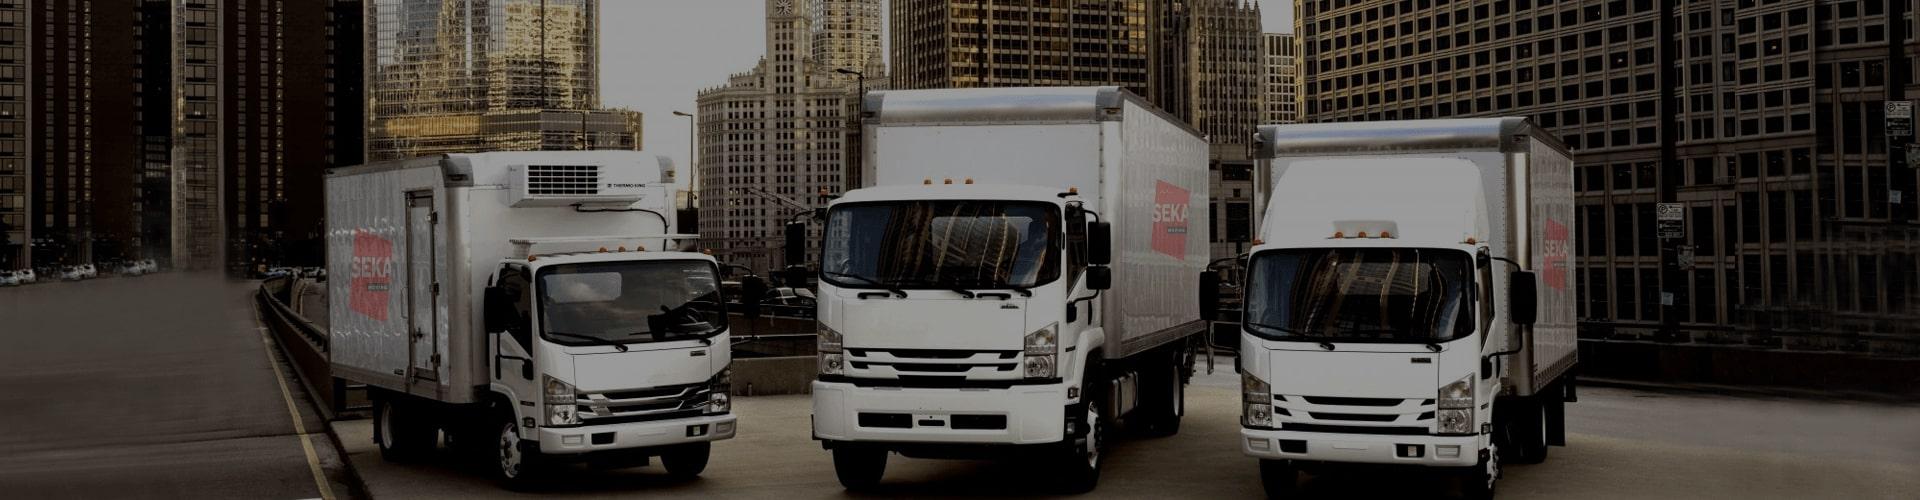 About Seka Moving | NYC Moving Company | SEKA Moving